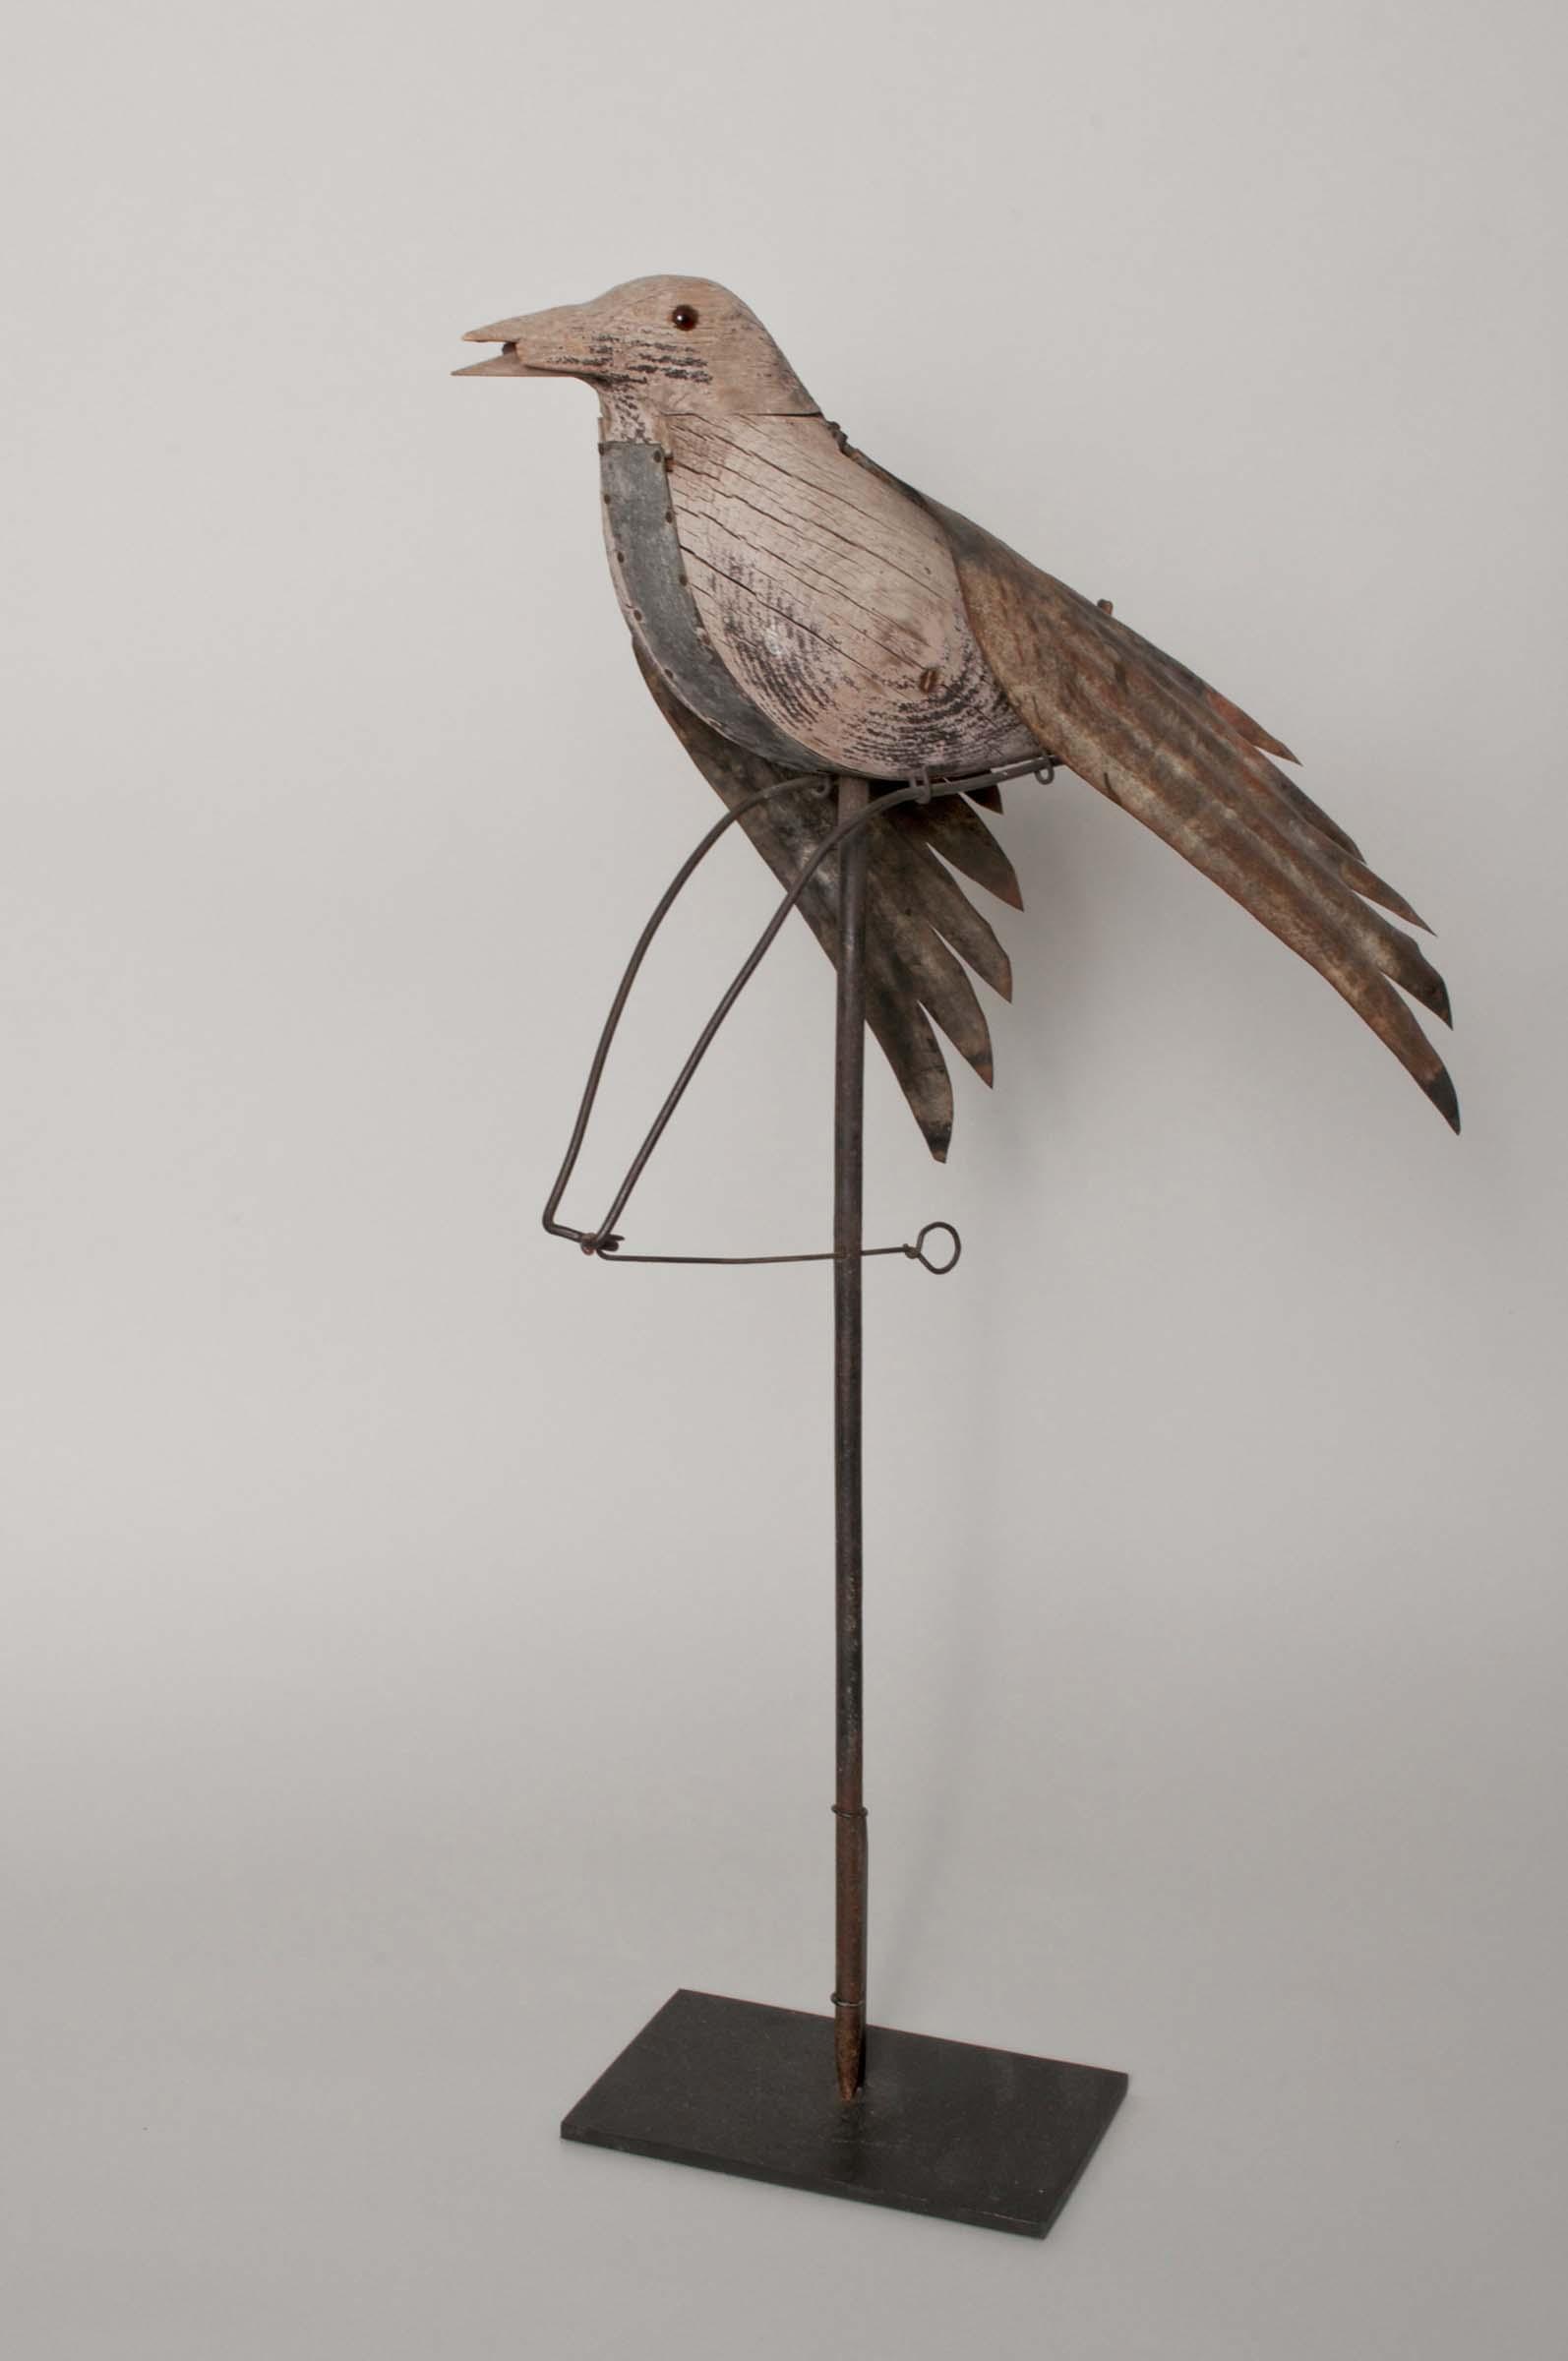 Charles Perdew III, Mechanical Crow Decoy, 1930, wood, 26h x 11w x 17d in.